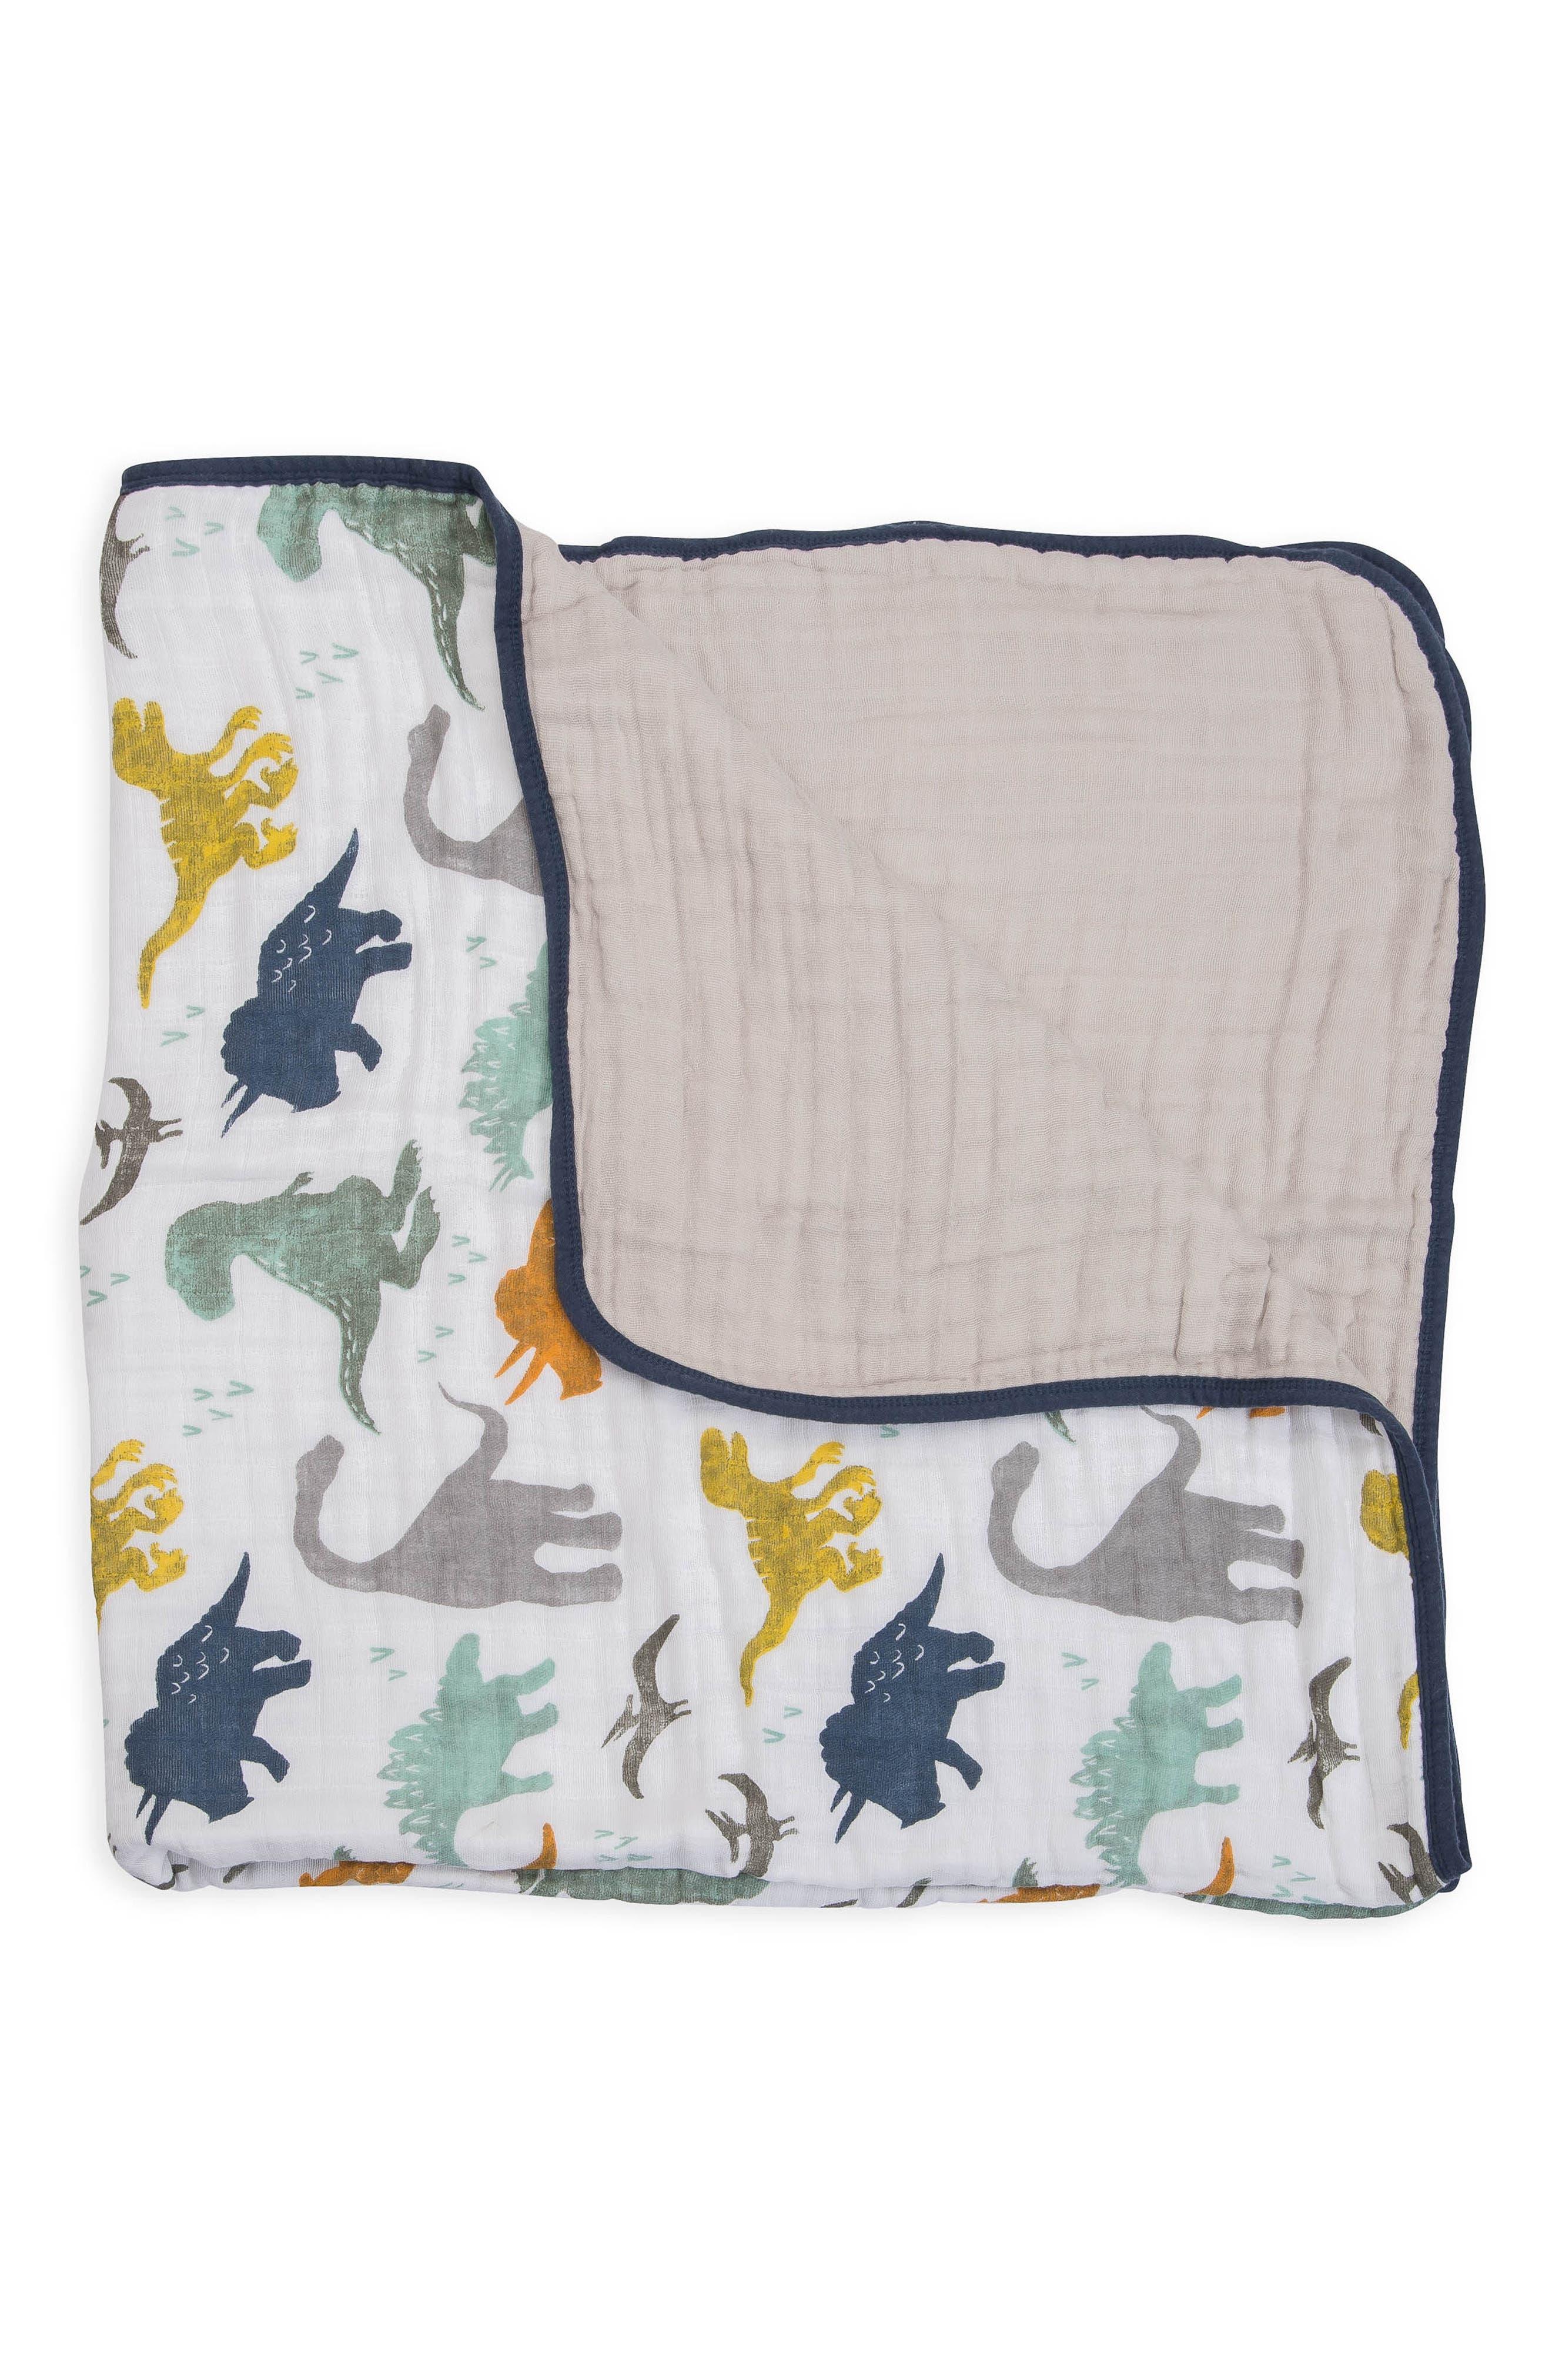 Cotton Muslin Quilt,                             Main thumbnail 1, color,                             DINO FRIENDS